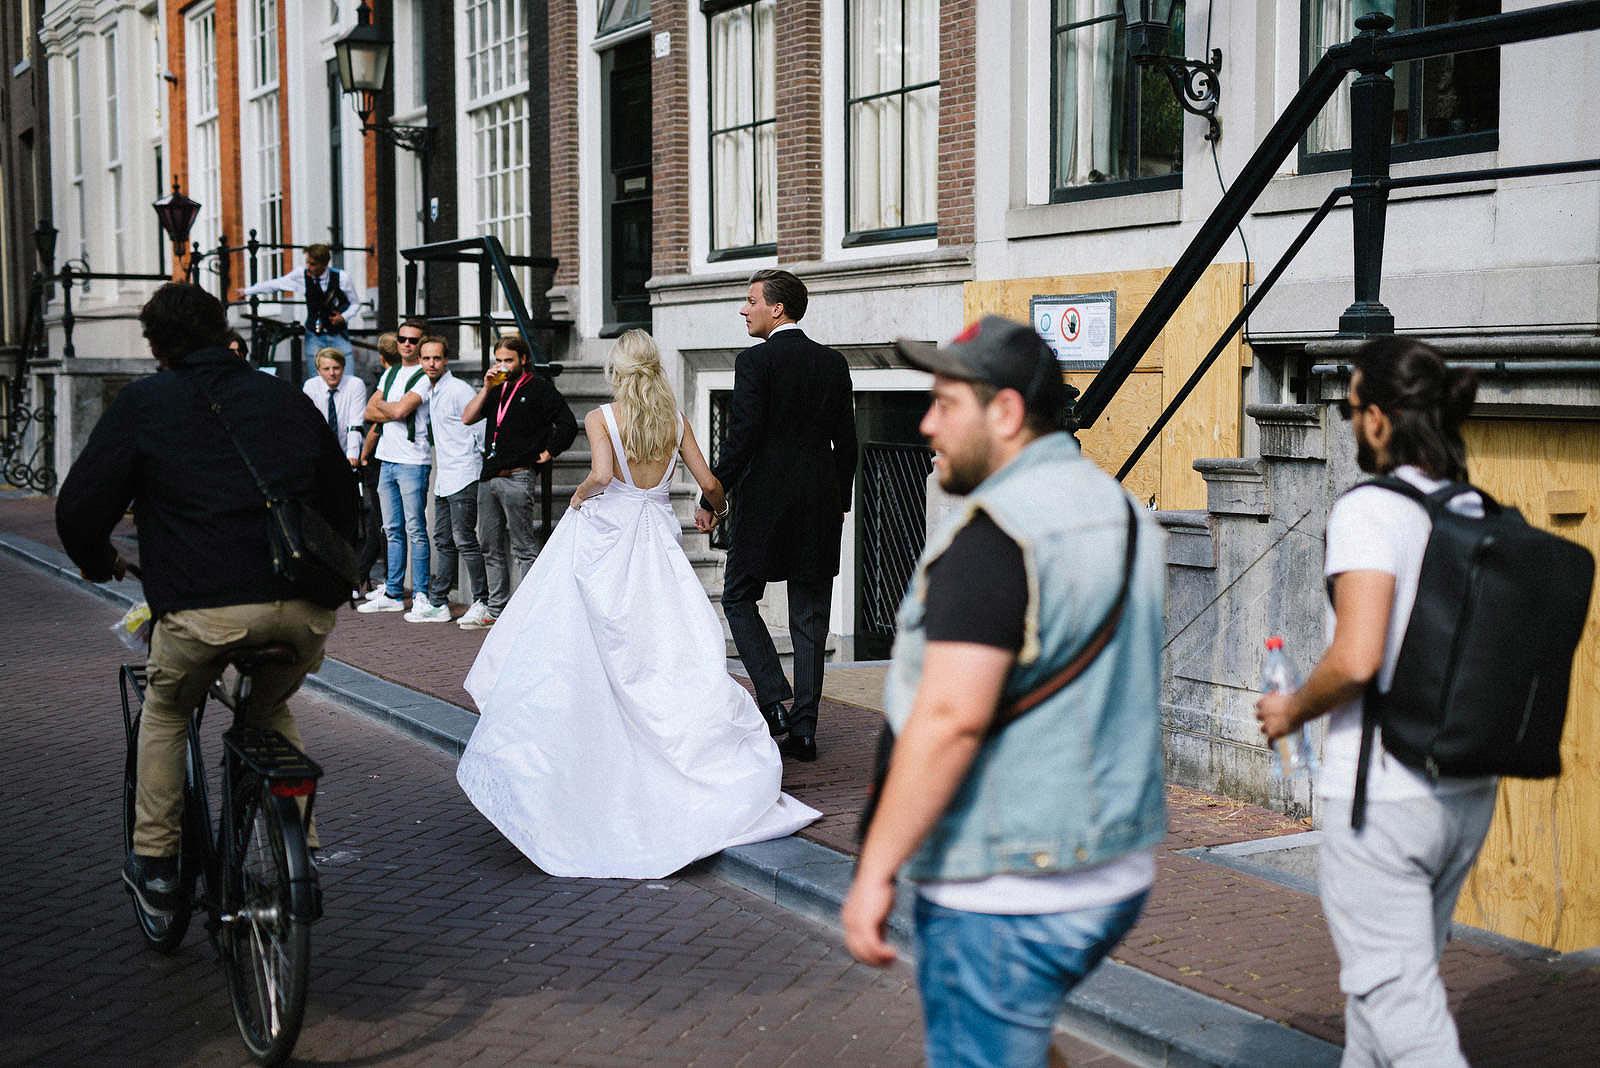 Fotograf Konstanz - Destination Wedding Photographer Amsterdam 081 - Destination Wedding Amsterdam  - 187 -